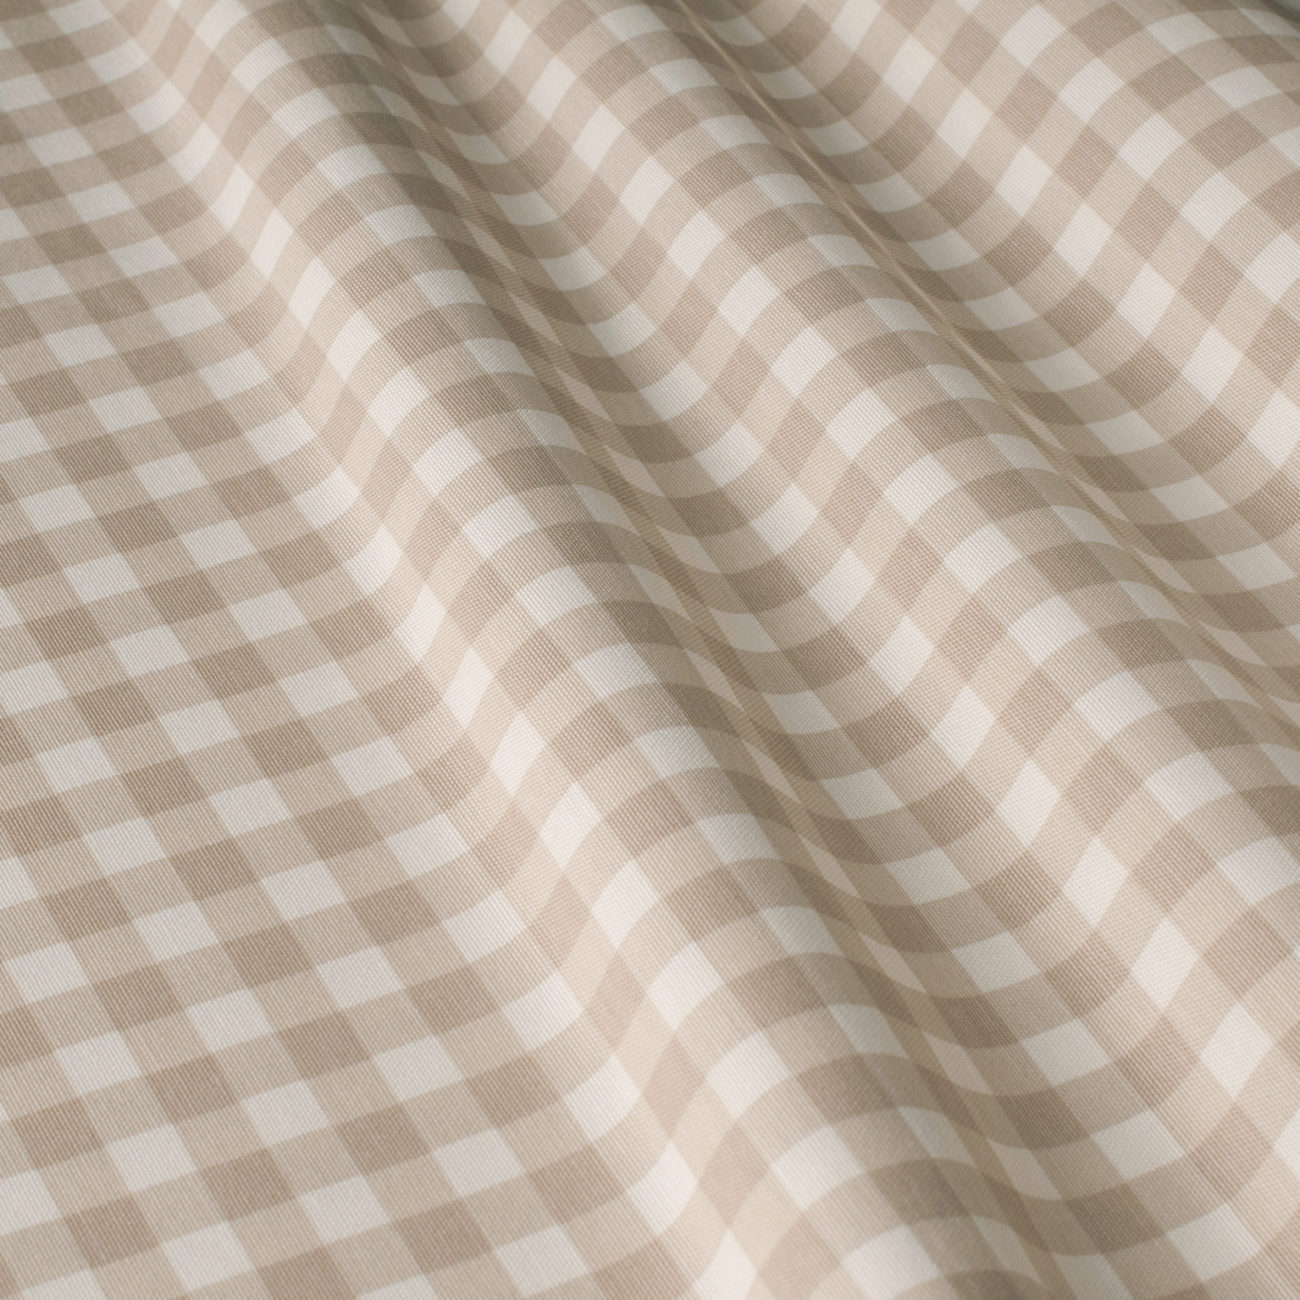 Mantel BISTROTBEIGE Cuadrícula1,3cm Rectangular 1,2x1,7m [enstockpara envíooretiro]